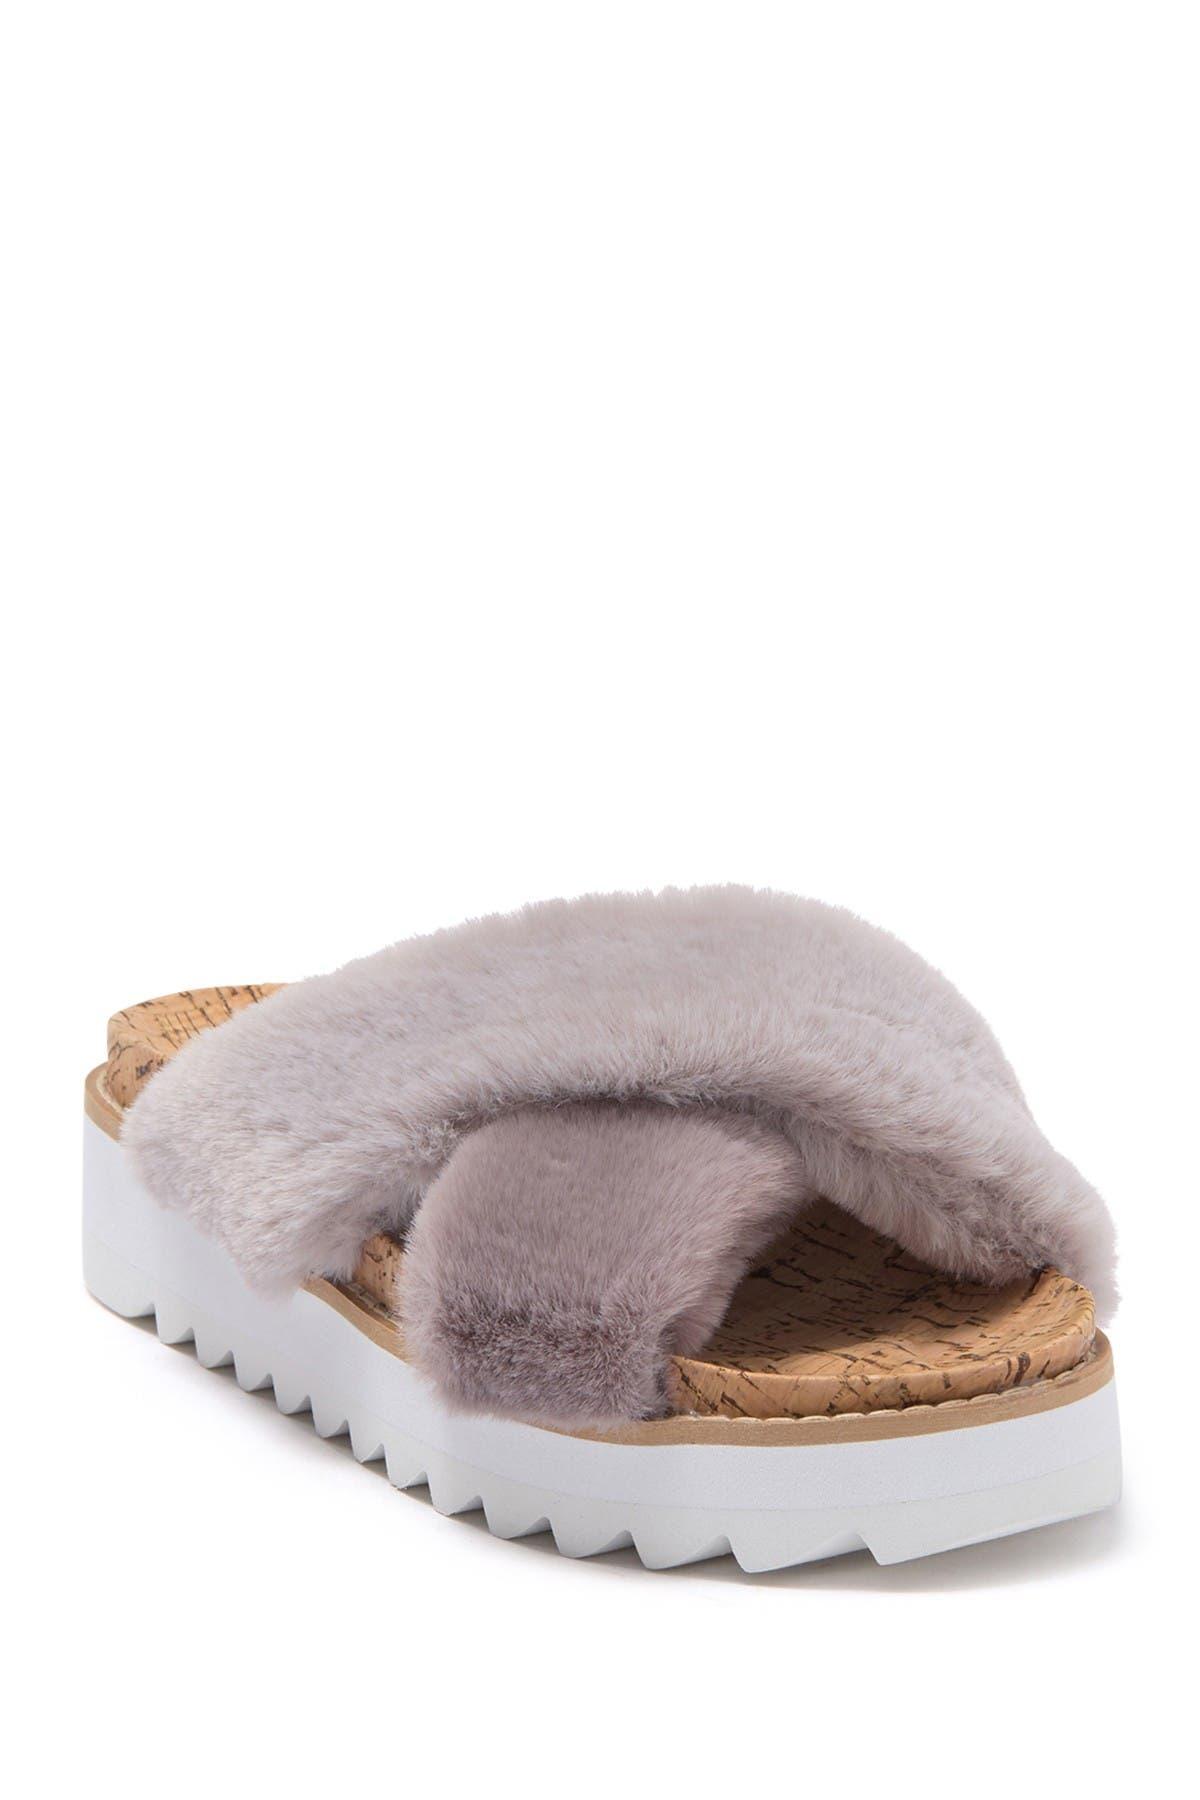 Image of STEVEN NEW YORK Cado Faux Fur Sandal